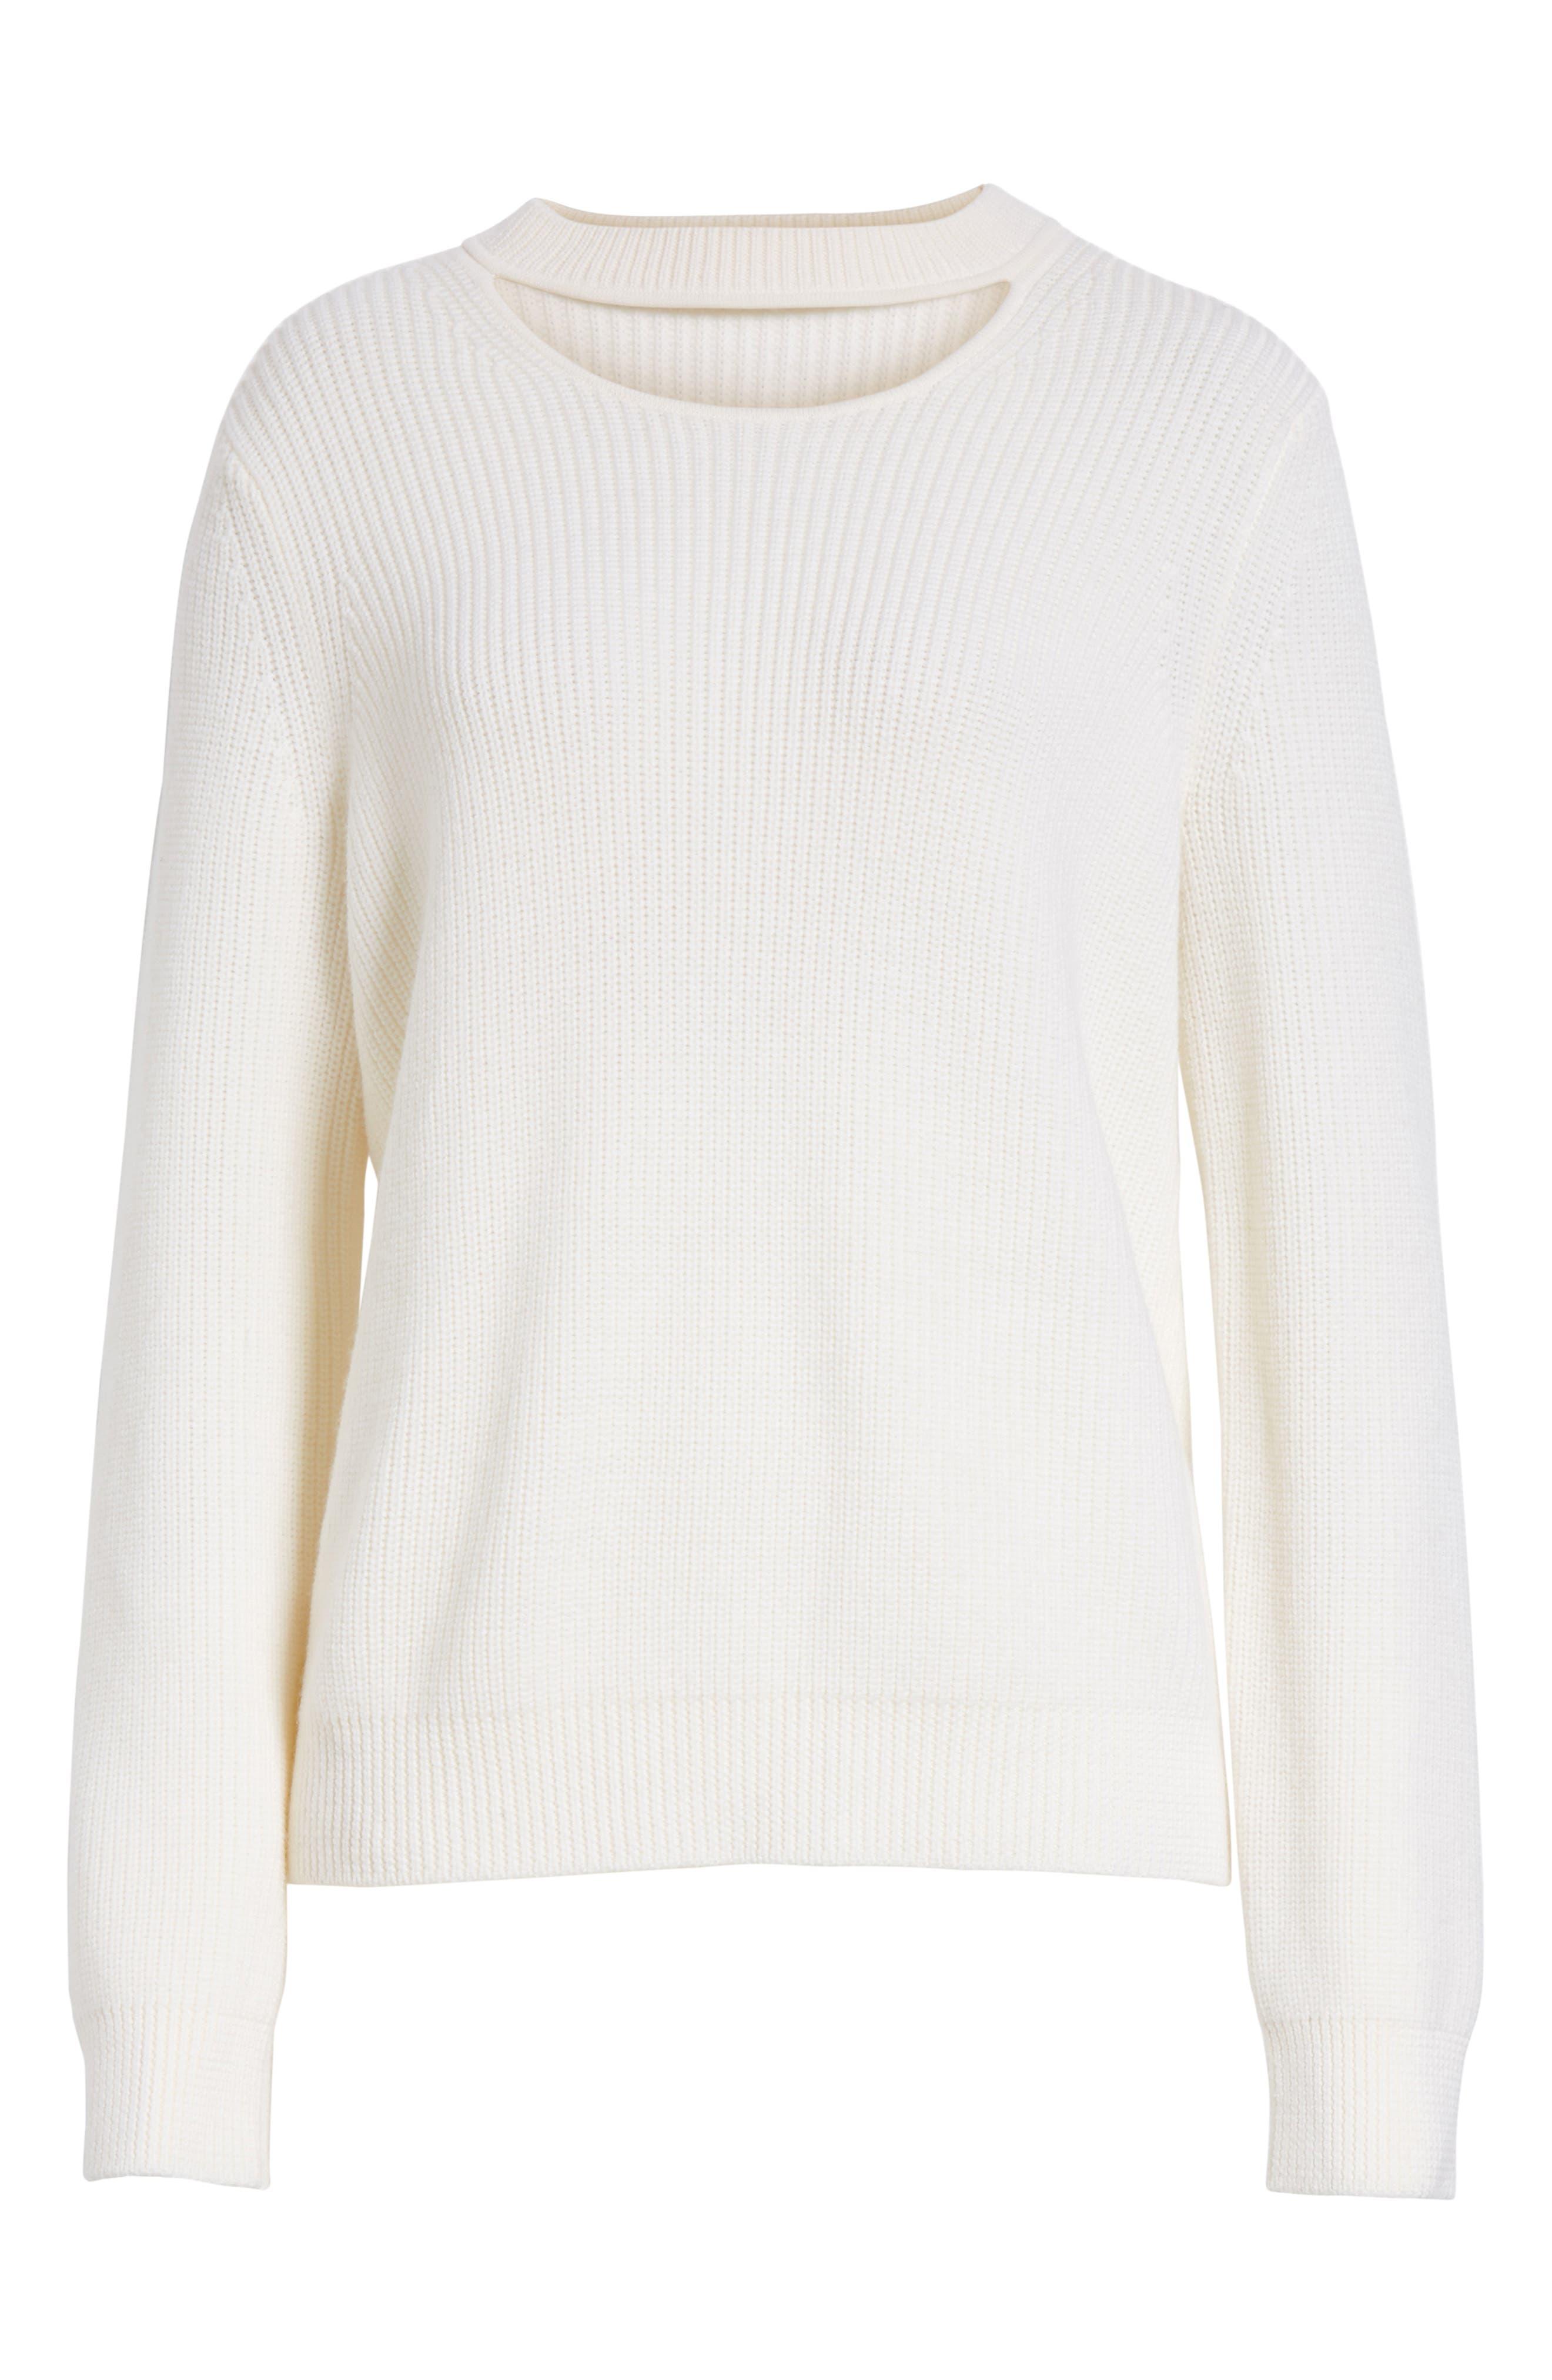 Tori Cutout Sweatshirt,                         Main,                         color, Ivory